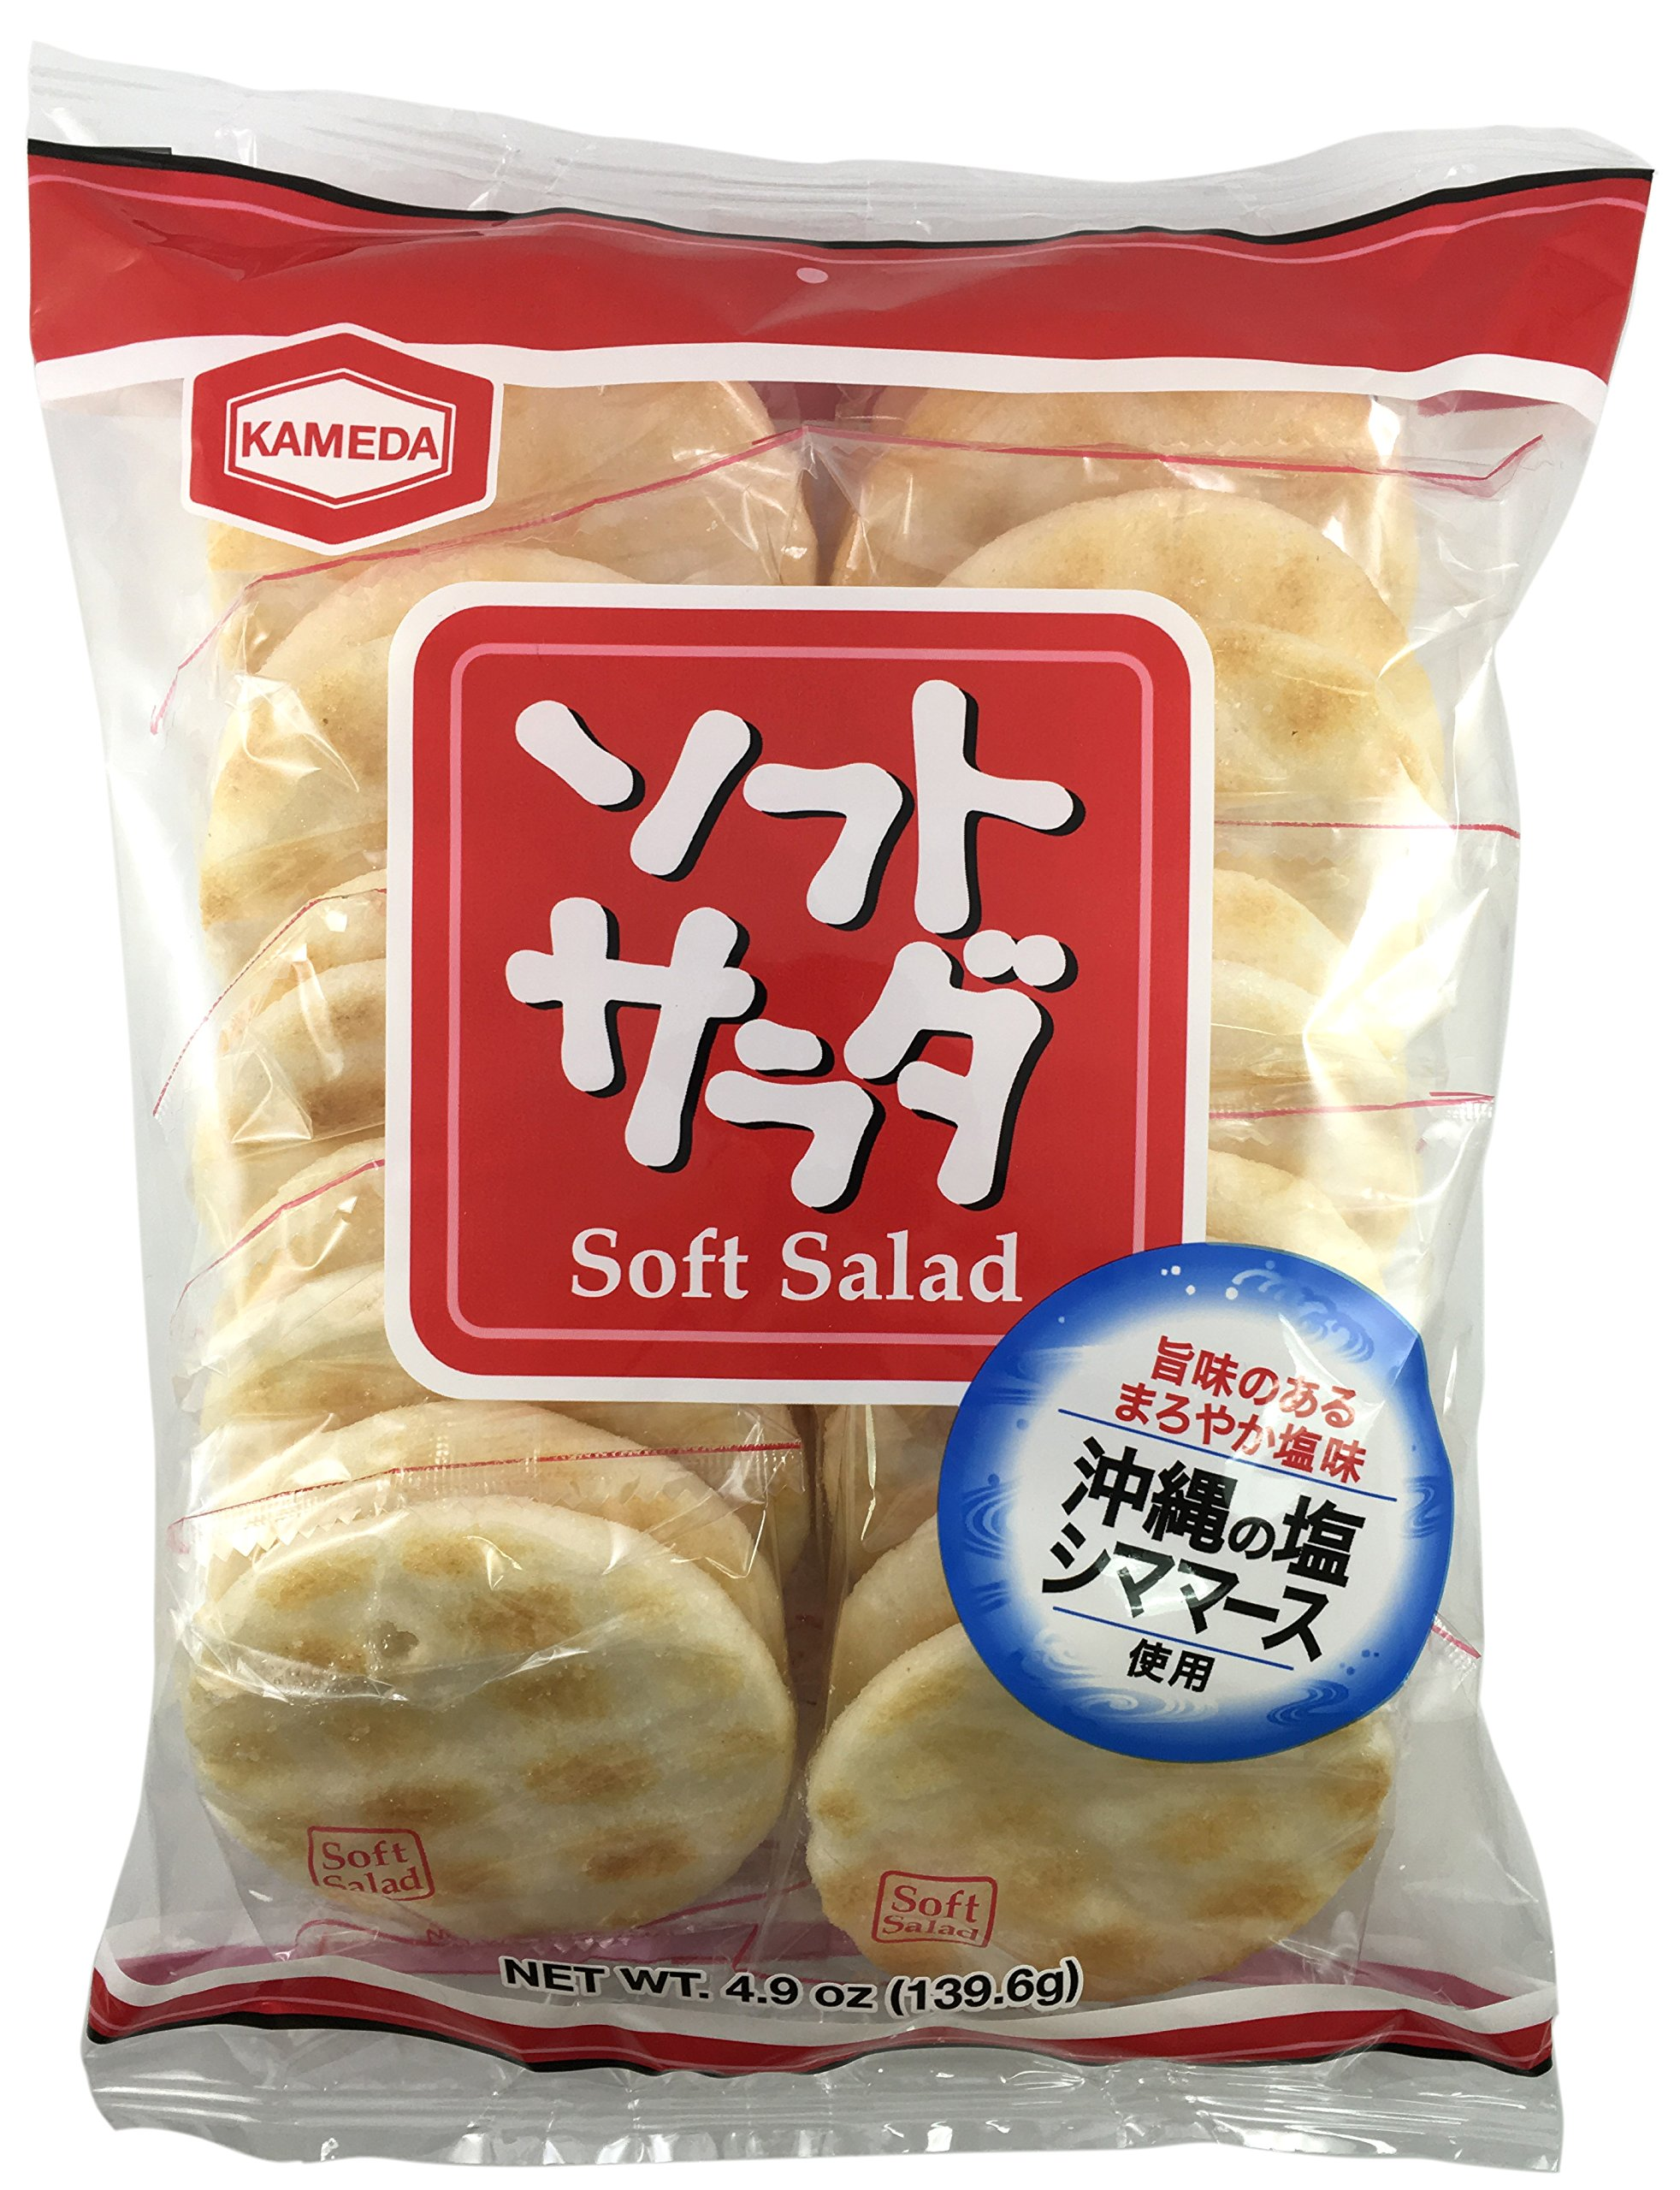 Kameda Soft Salad Rice Crackers 20pcs 4.9oz by Kameda